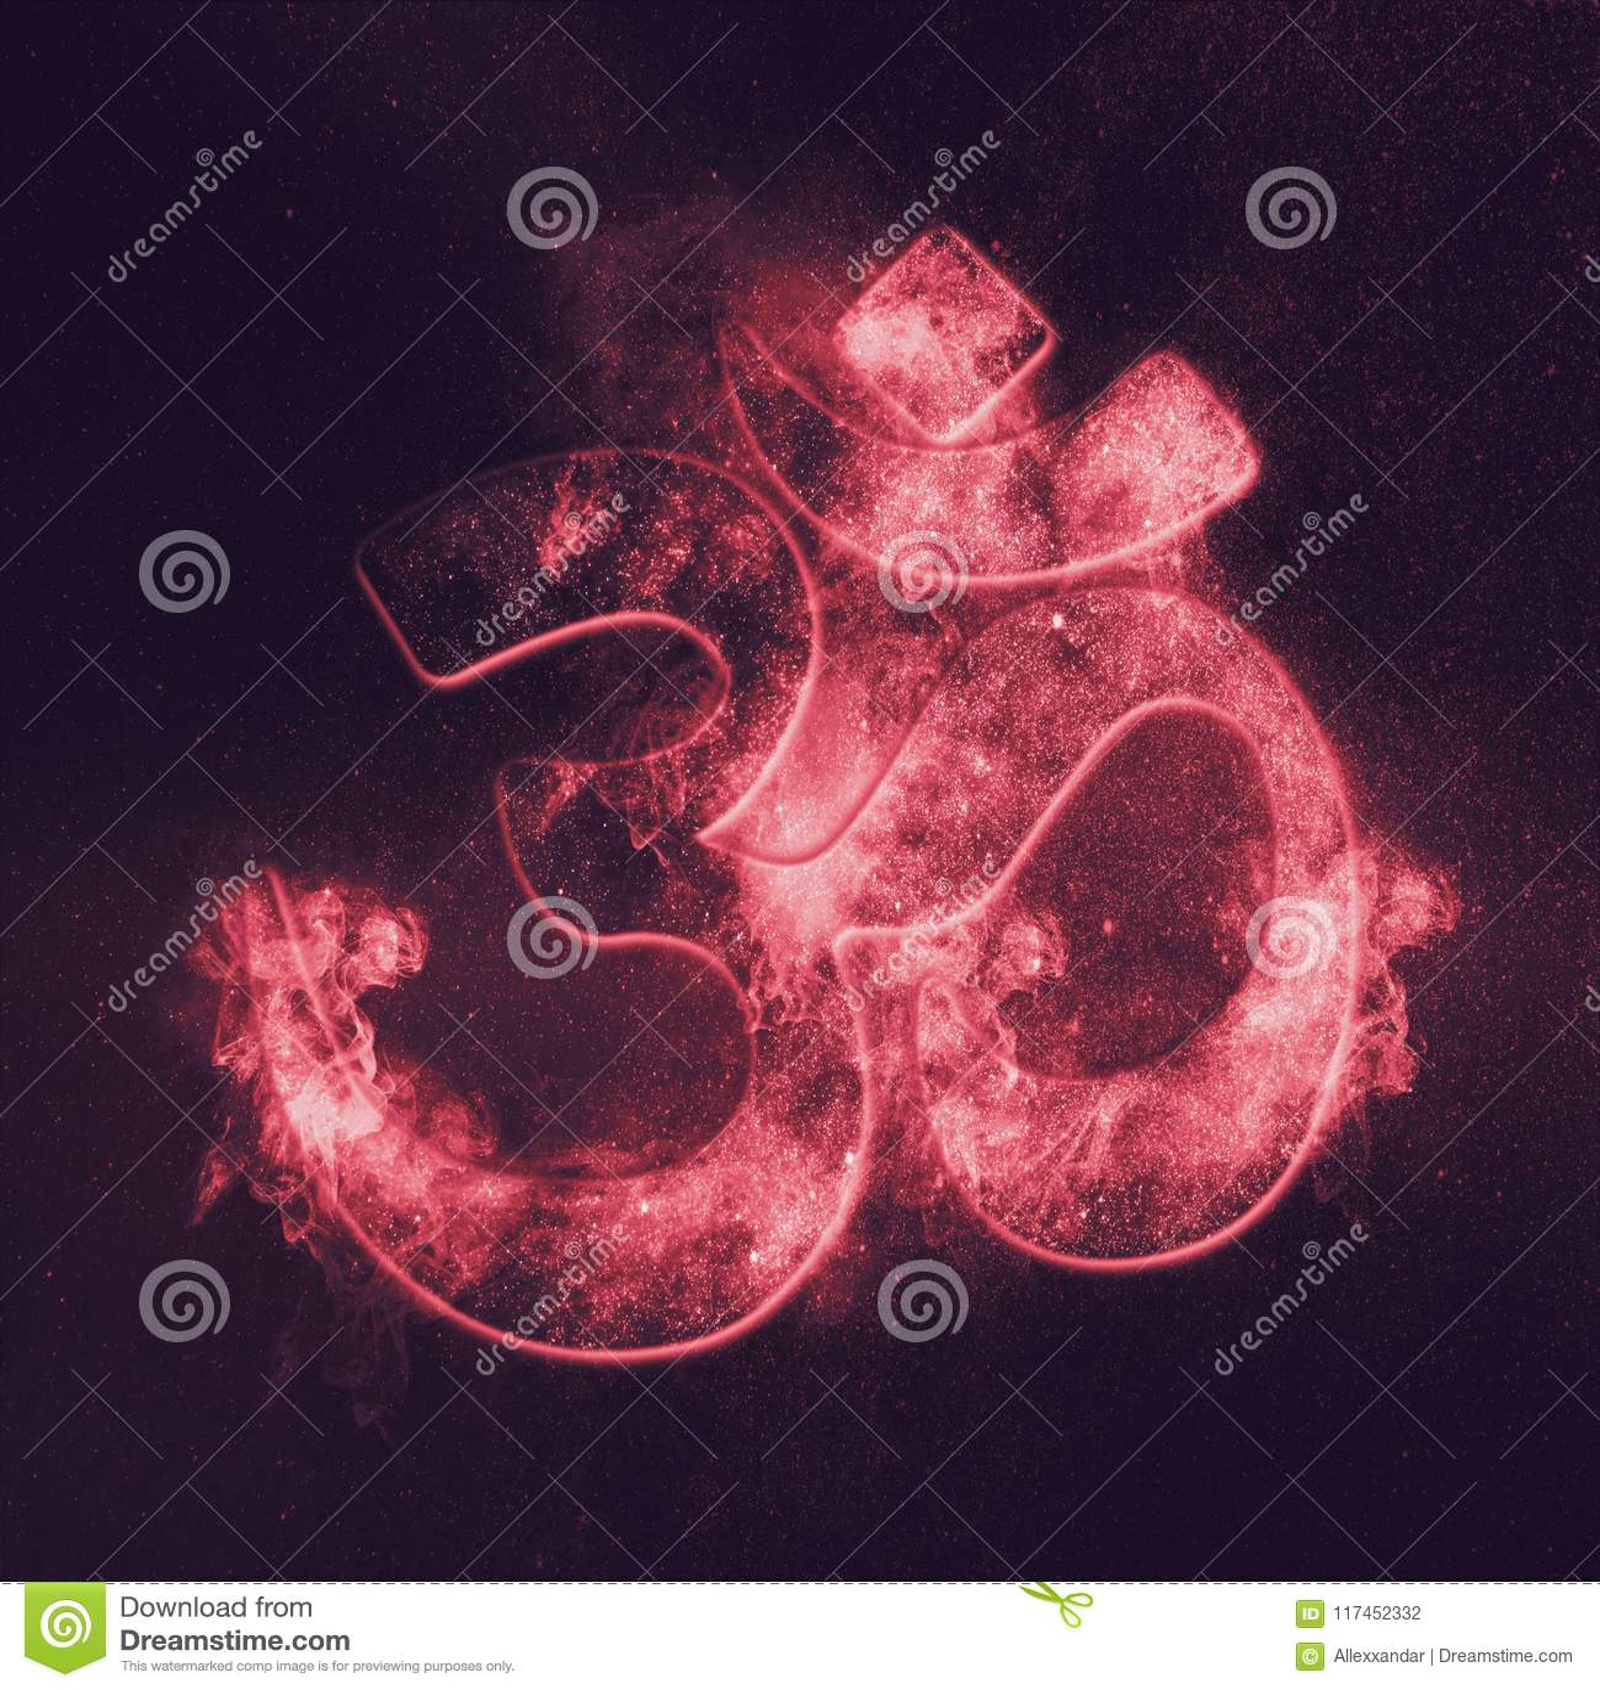 Om symbol. Hindu religion. Abstract night sky background.